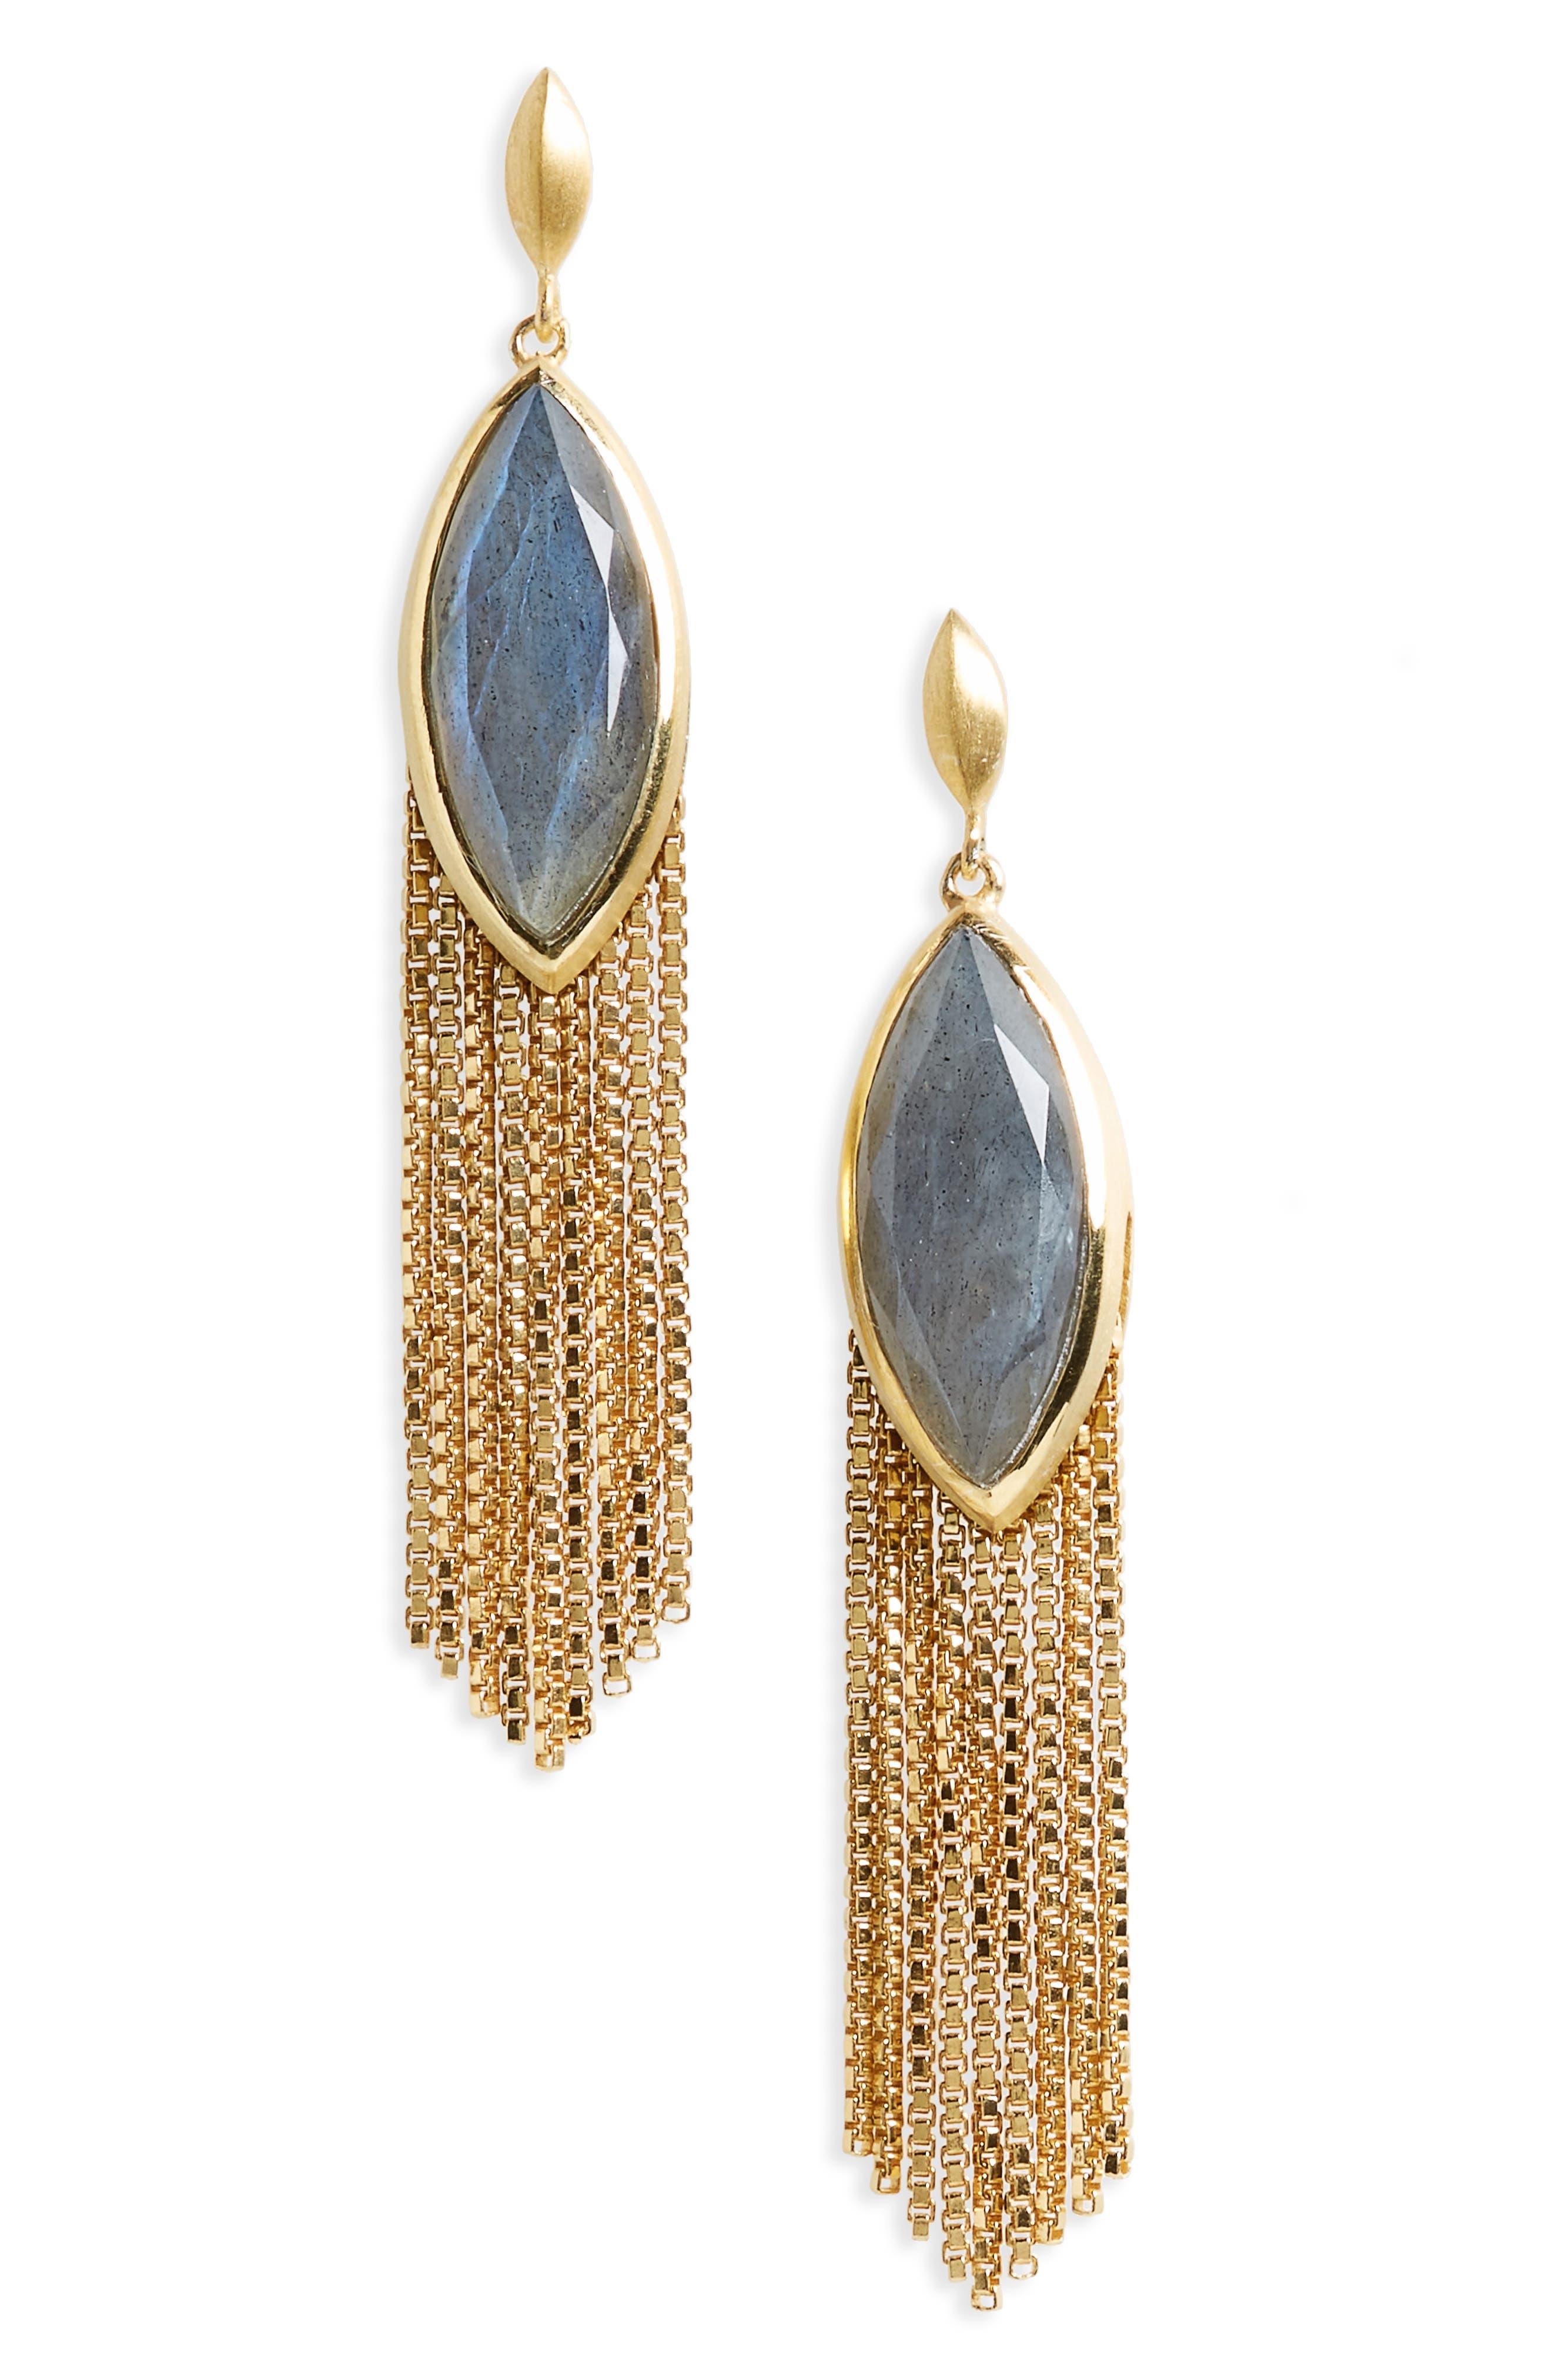 Dean Davidson Ornate Semiprecious Stone Fringe Earrings